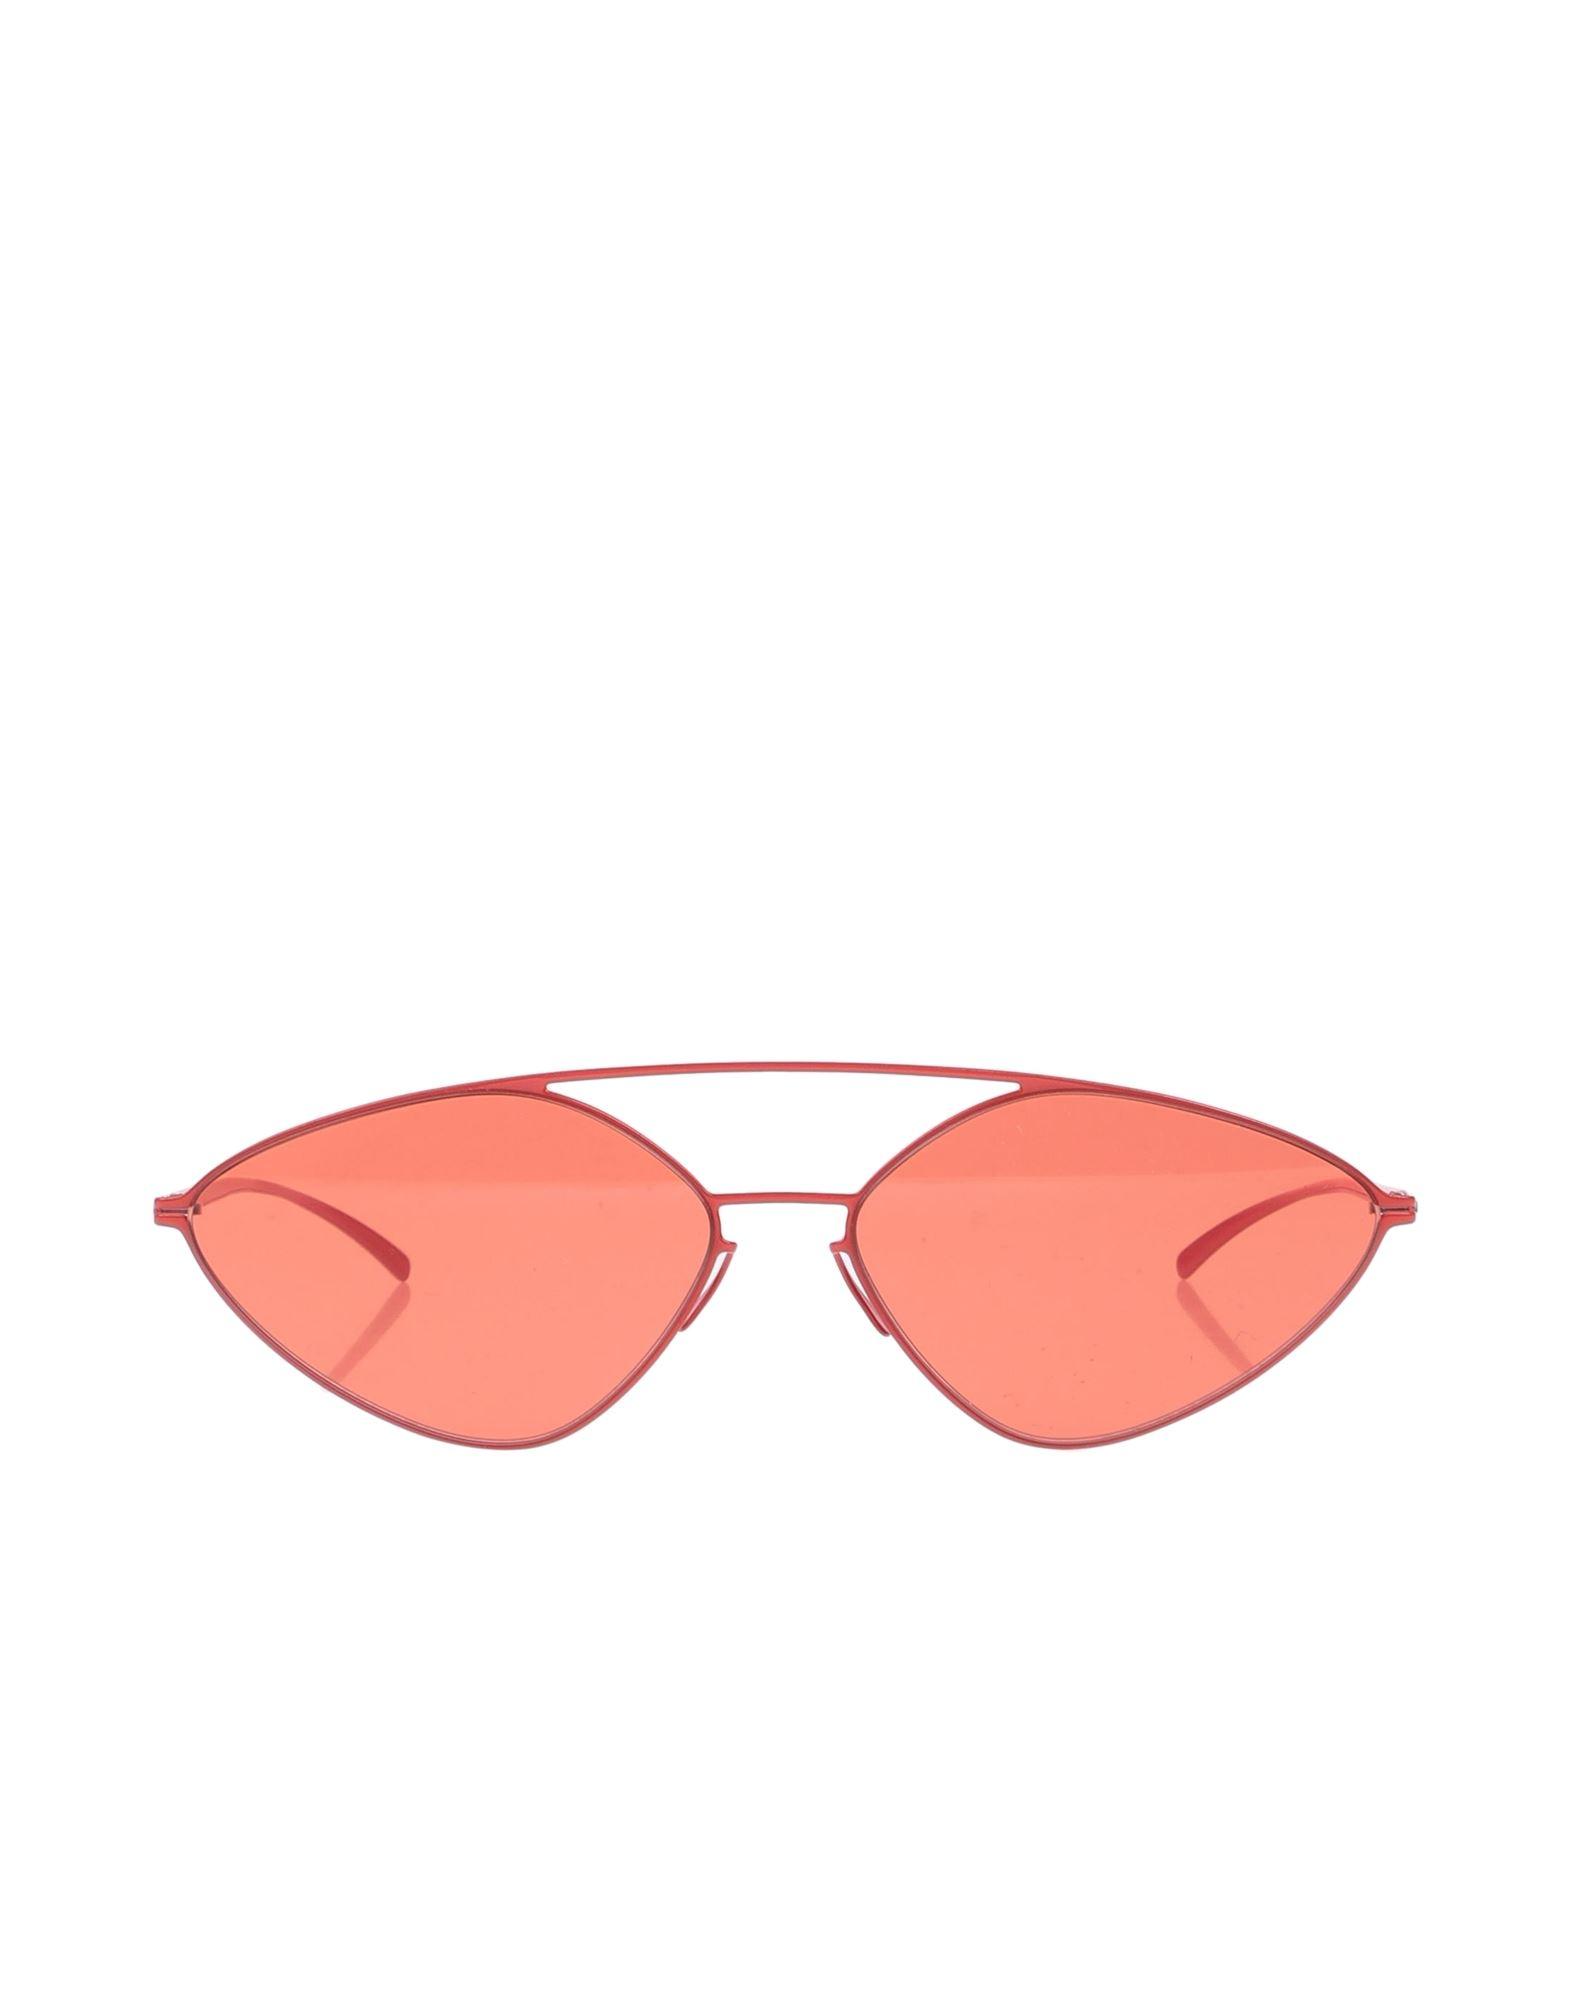 MYKITA + MAISON MARGIELA Sunglasses - Item 46738130